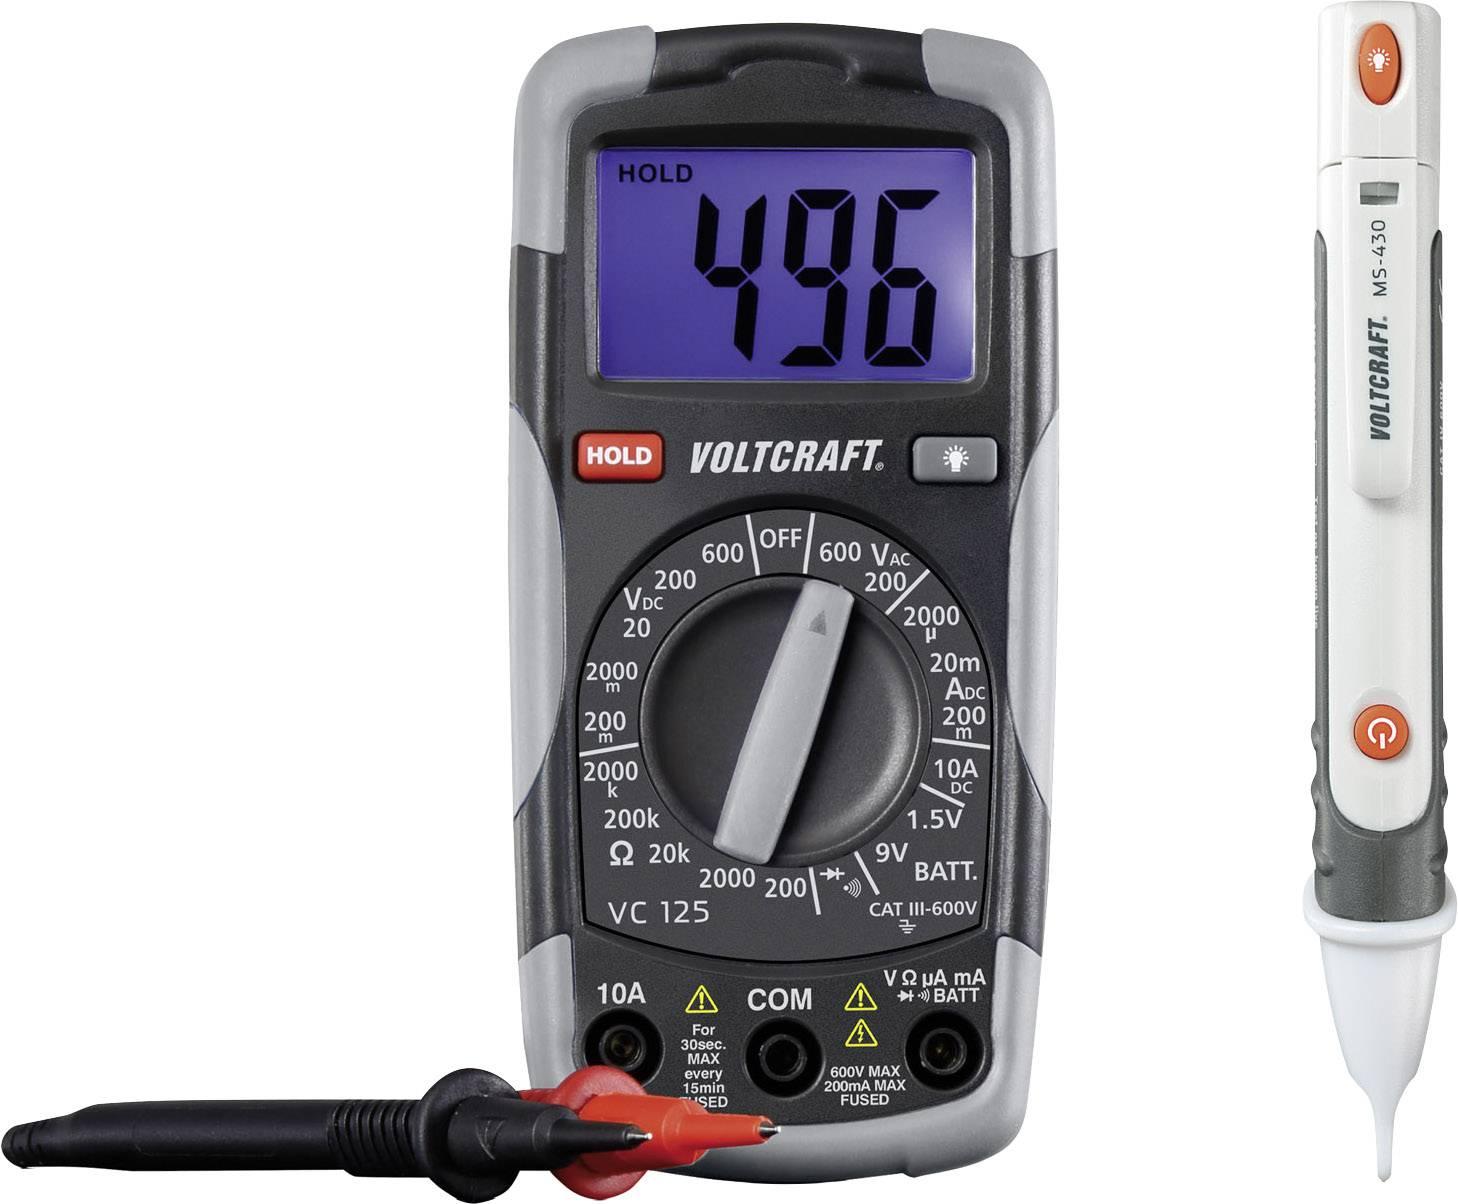 Digitálny multimeter a skúšačka Voltcraft DT-TEST-KIT 150